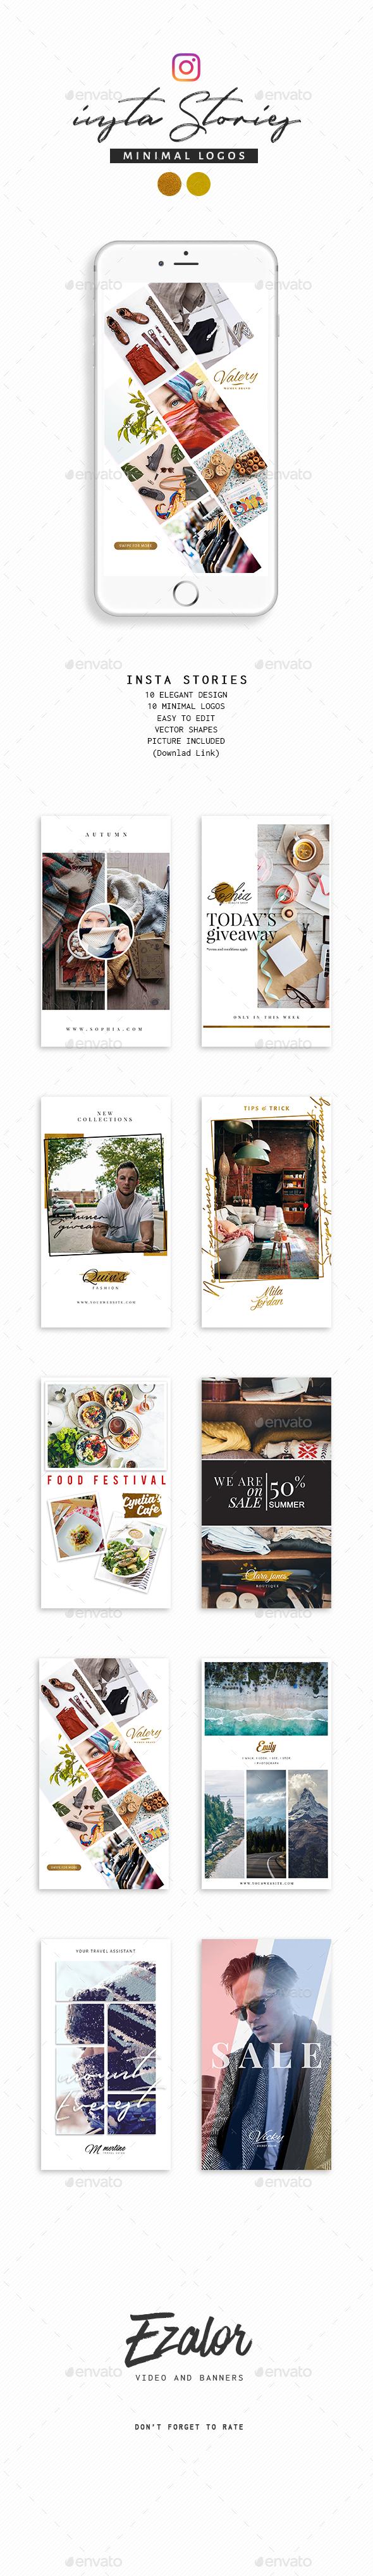 Stories and Logos Vol 2 - Social Media Web Elements